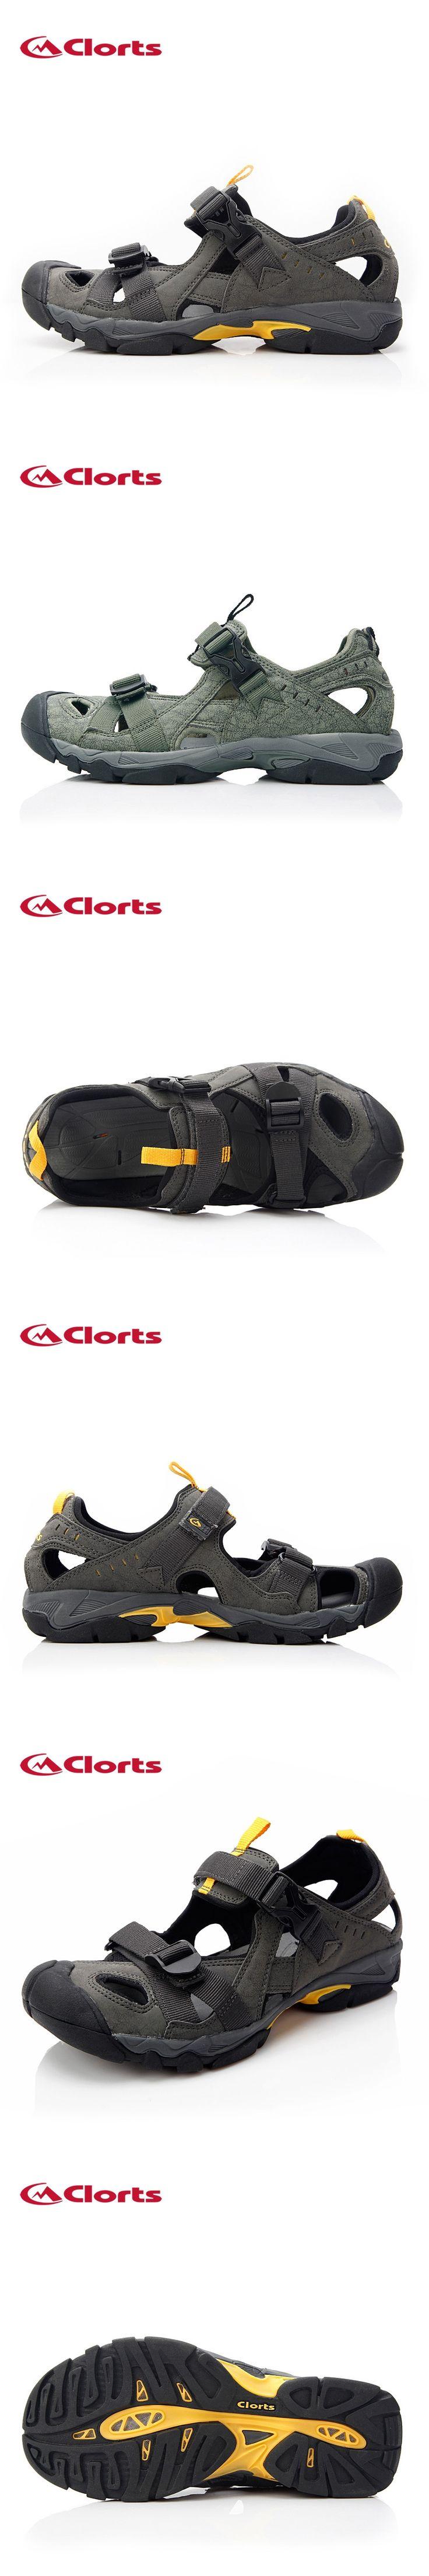 Clorts Aqua Shoes Men Summer Beach Shoes PU Water Sandals Mens Water Shoes SD-206C/D